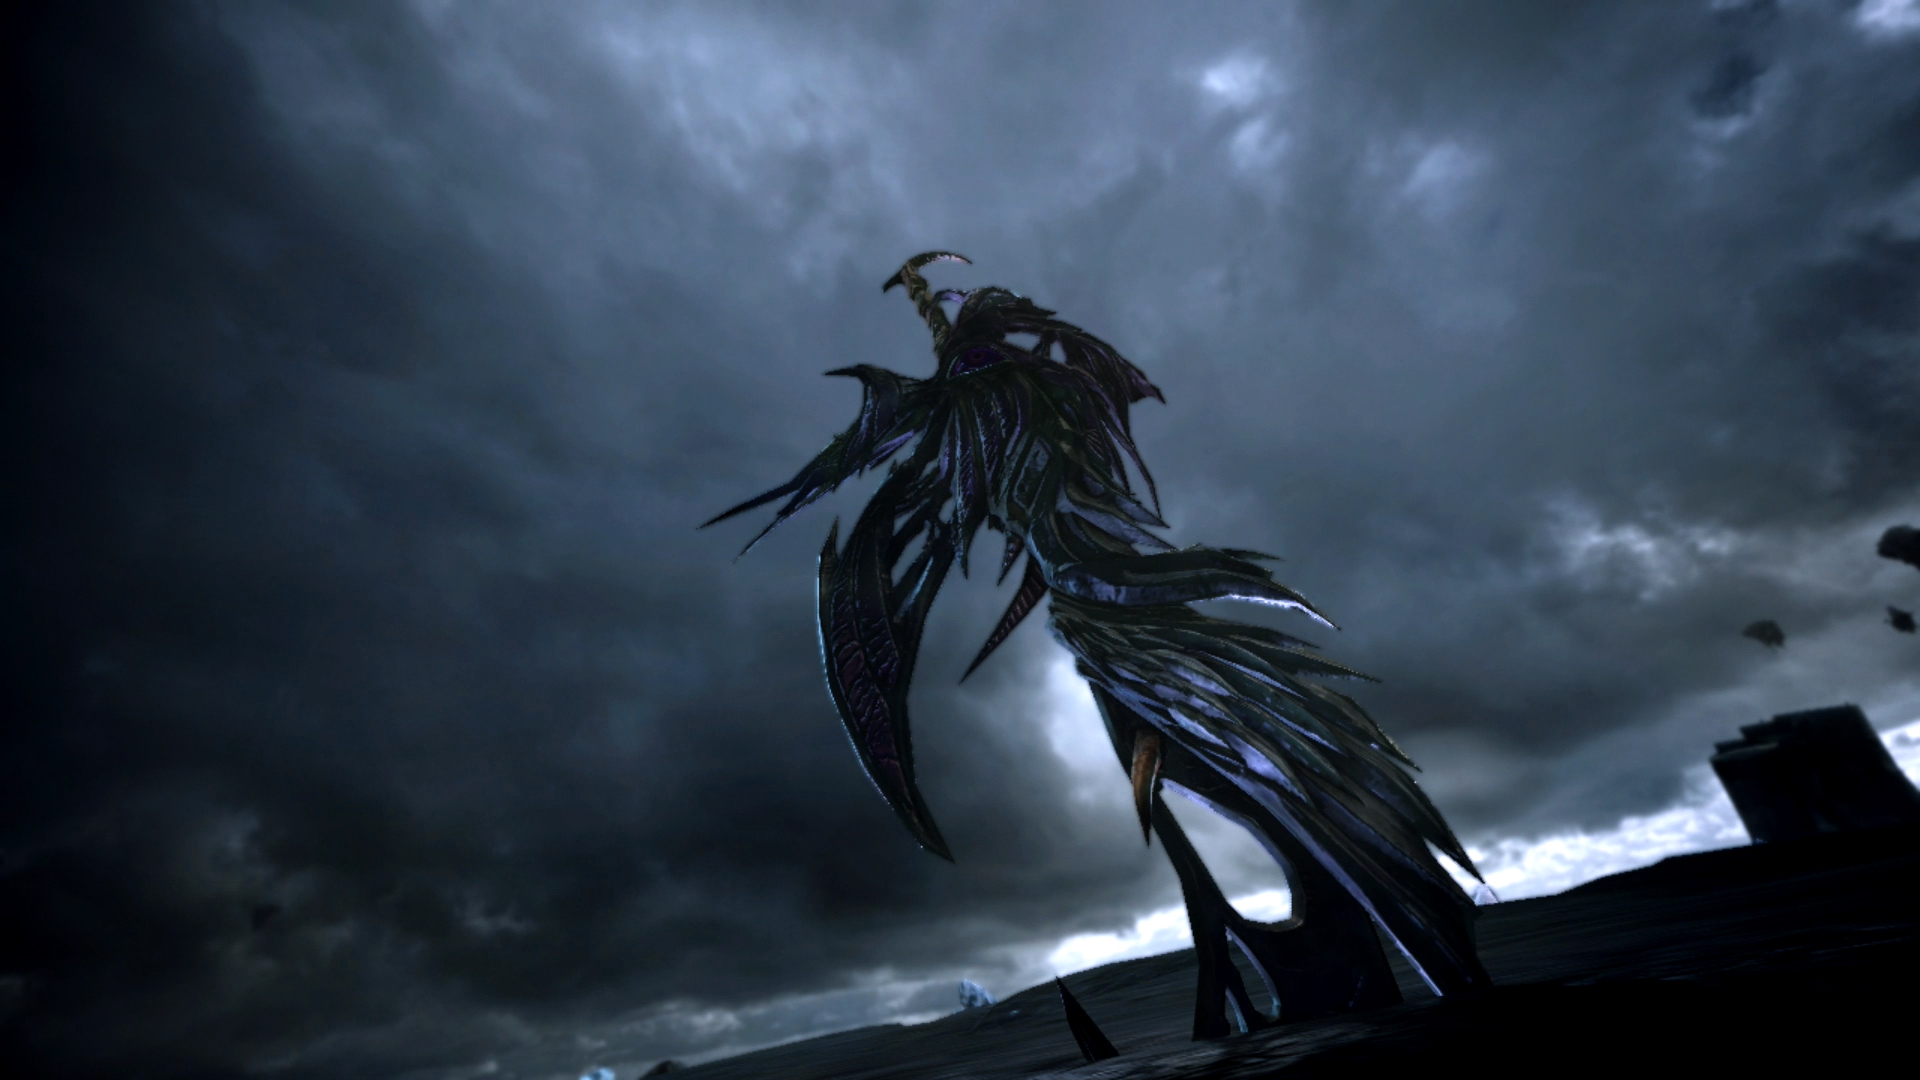 Wallpapers fond decran pour Final Fantasy XIII 2 PC PS3 Xbox 360 1920x1080